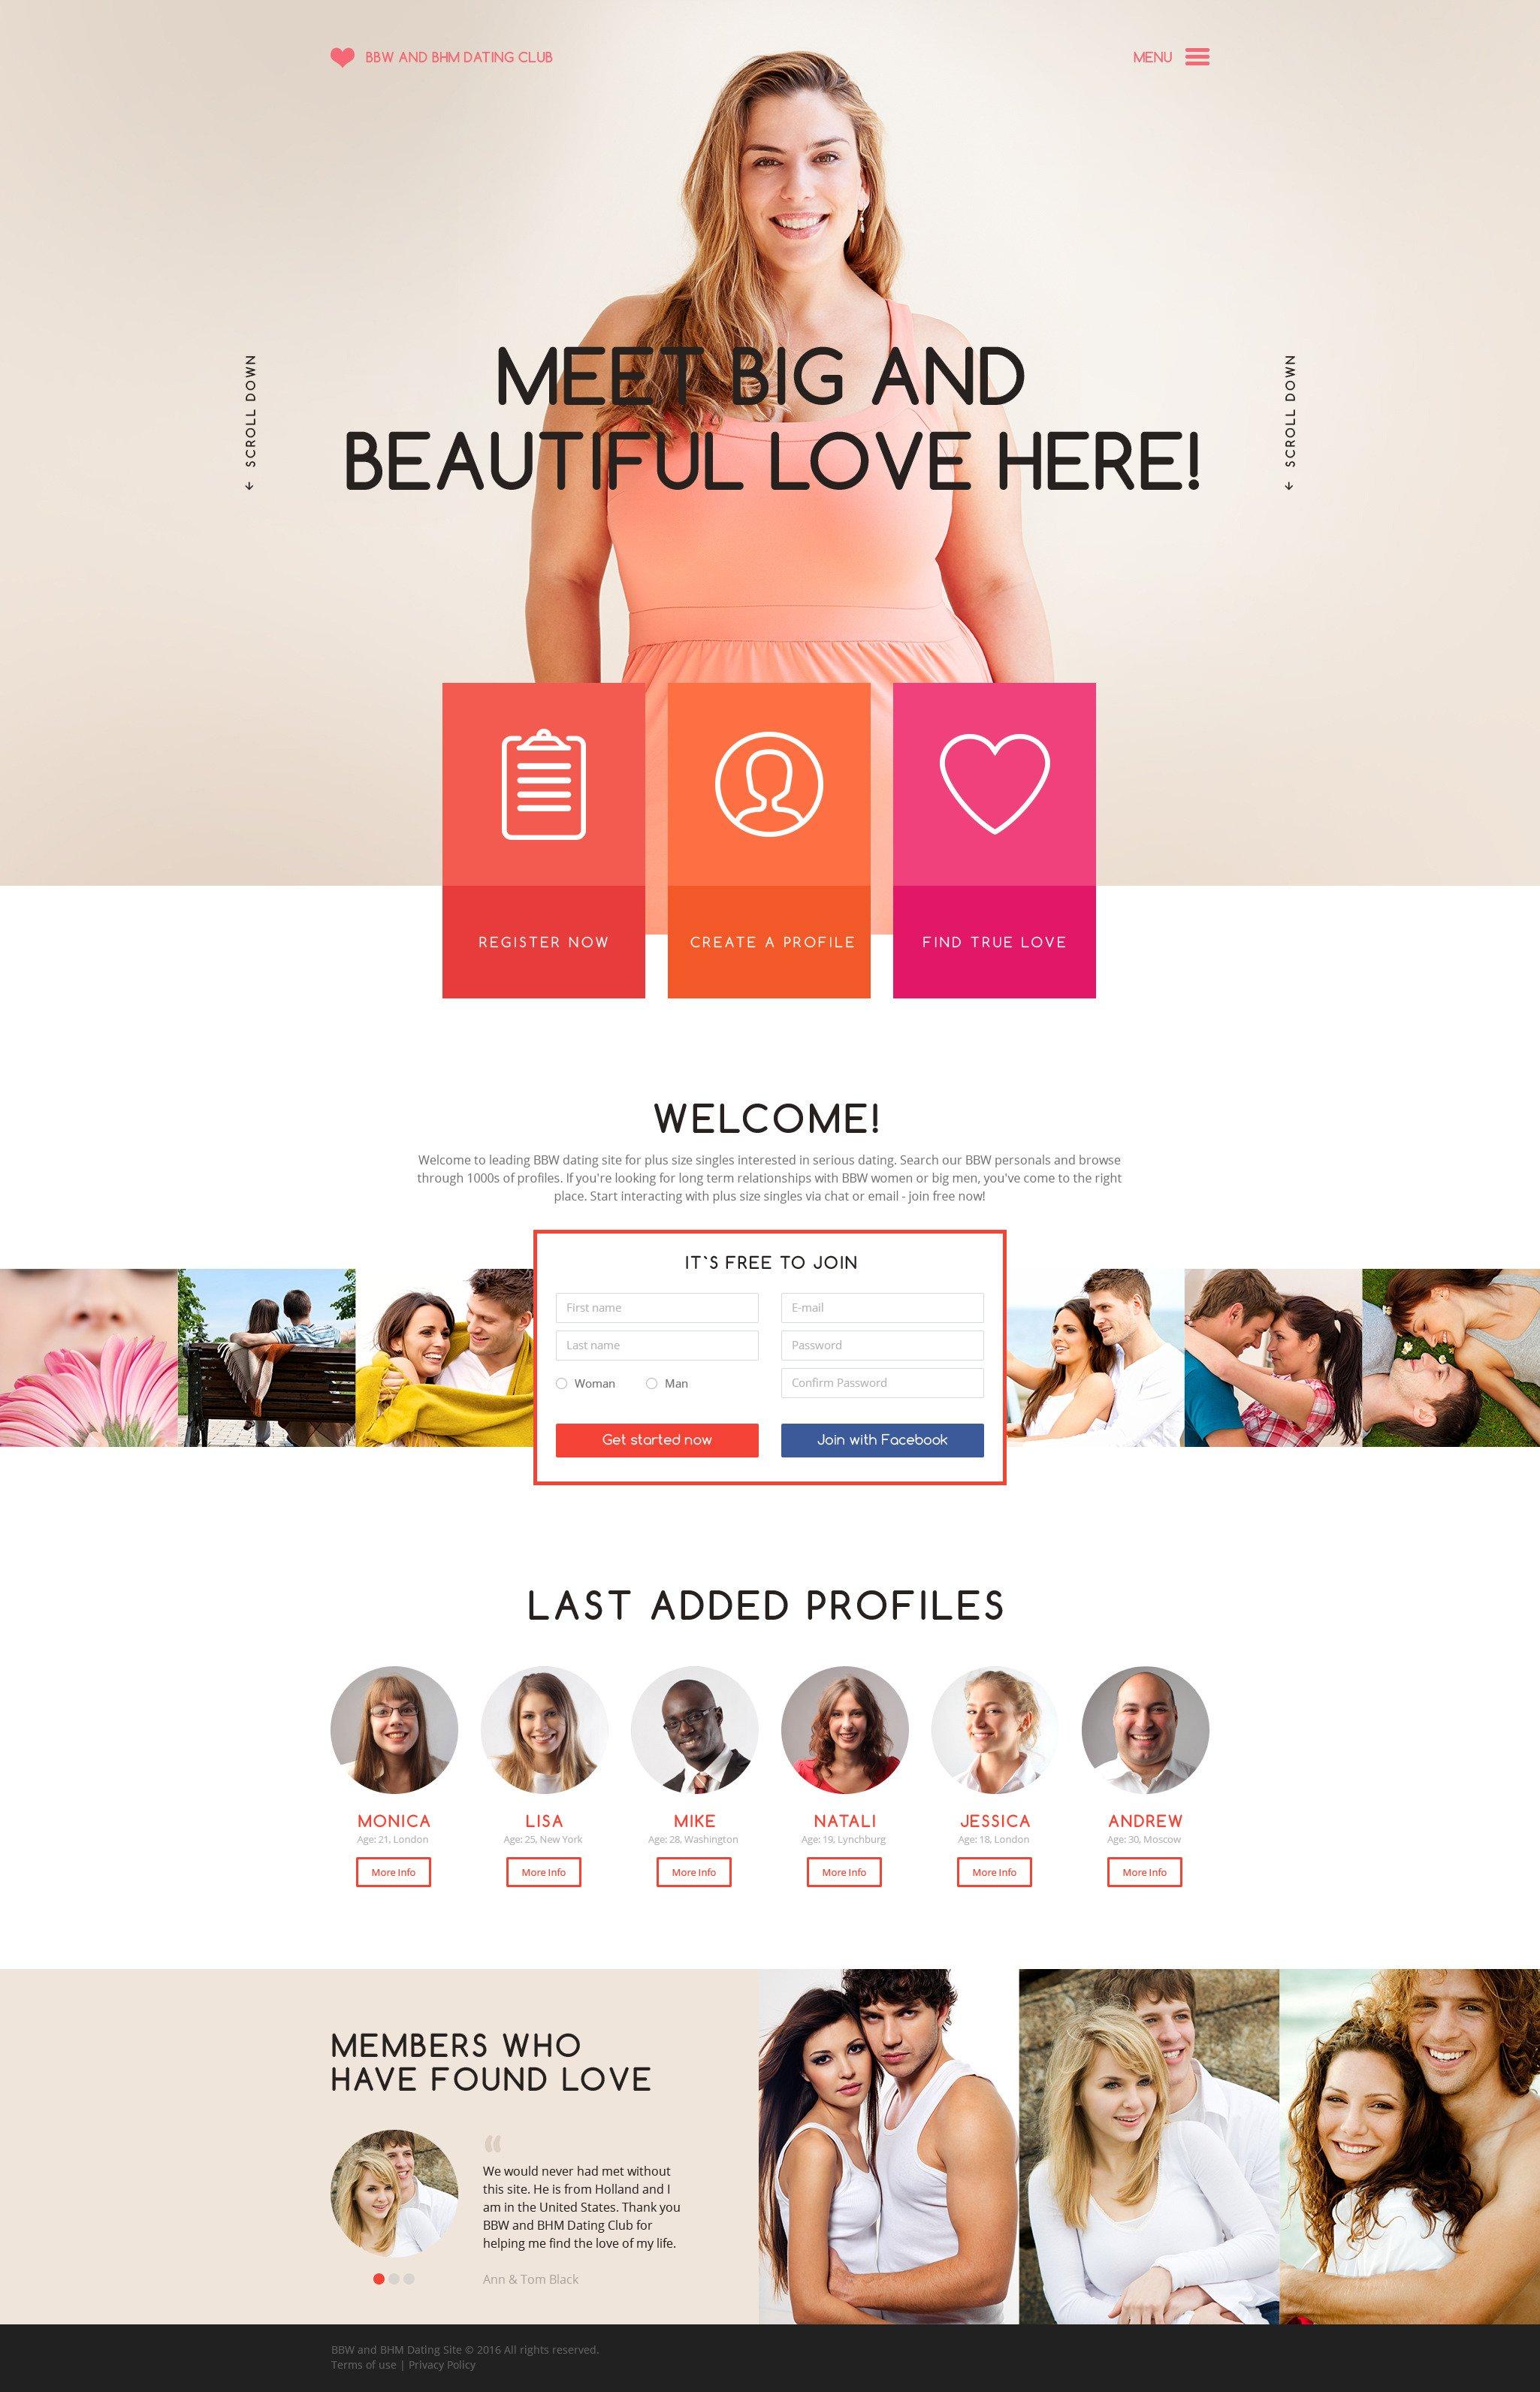 Fabbrini gioielli online dating